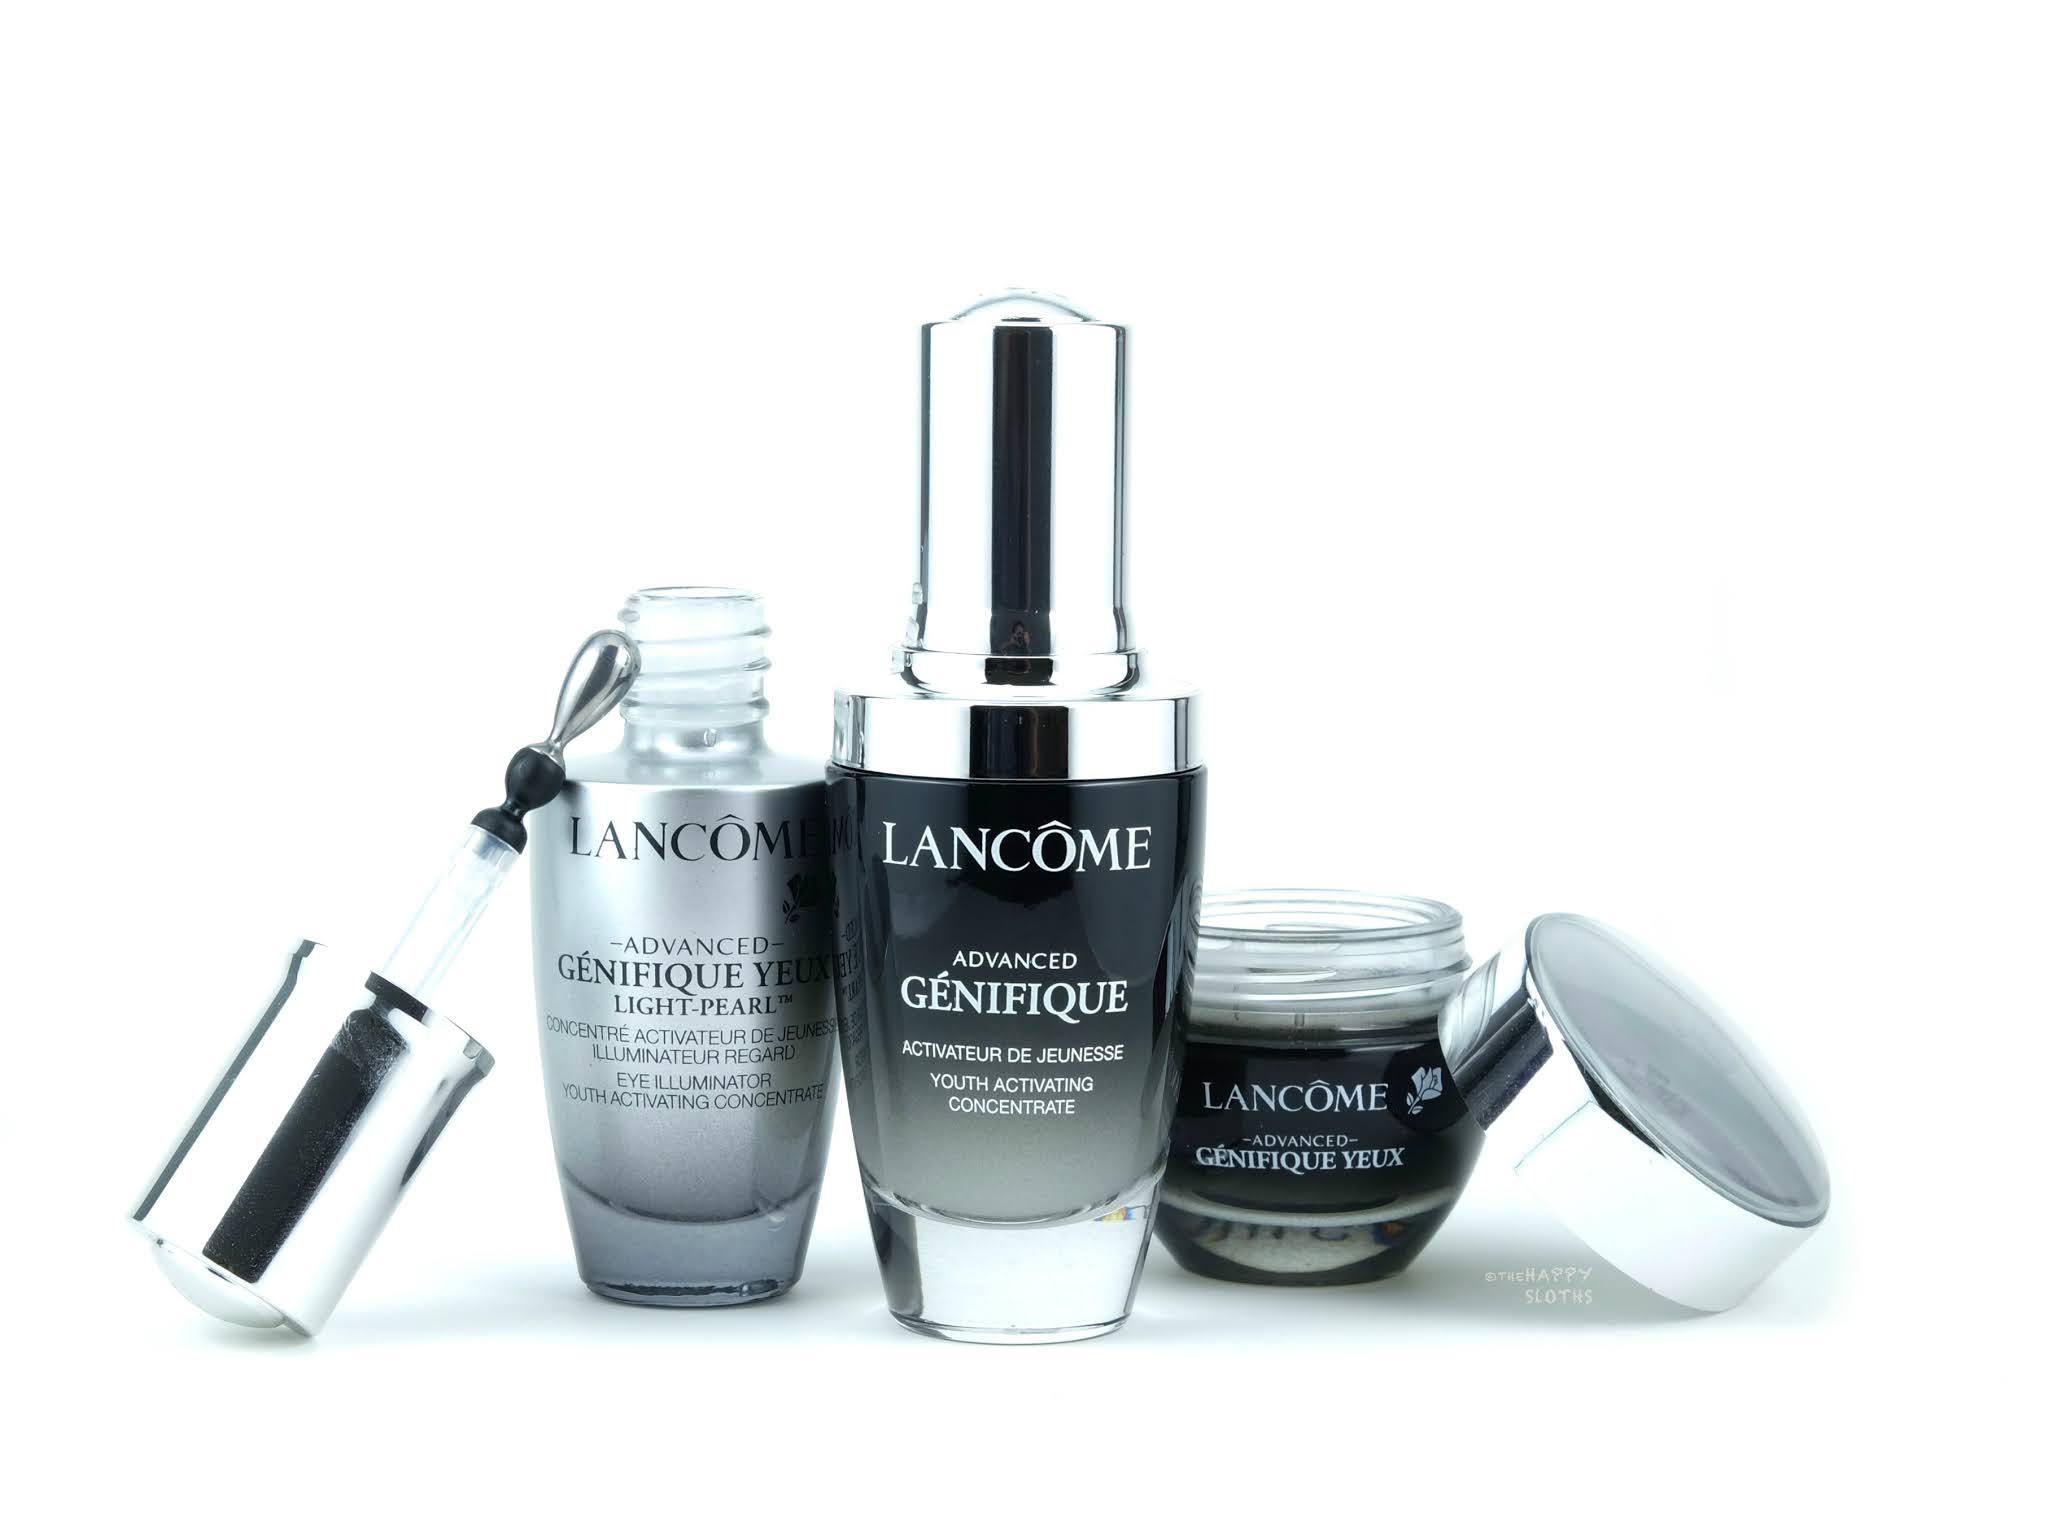 Lancôme | *NEW* Advanced Génifique Youth Activating Serum, Advanced Génifique Yeux Light-Pearl Serum & Eye Cream: Review